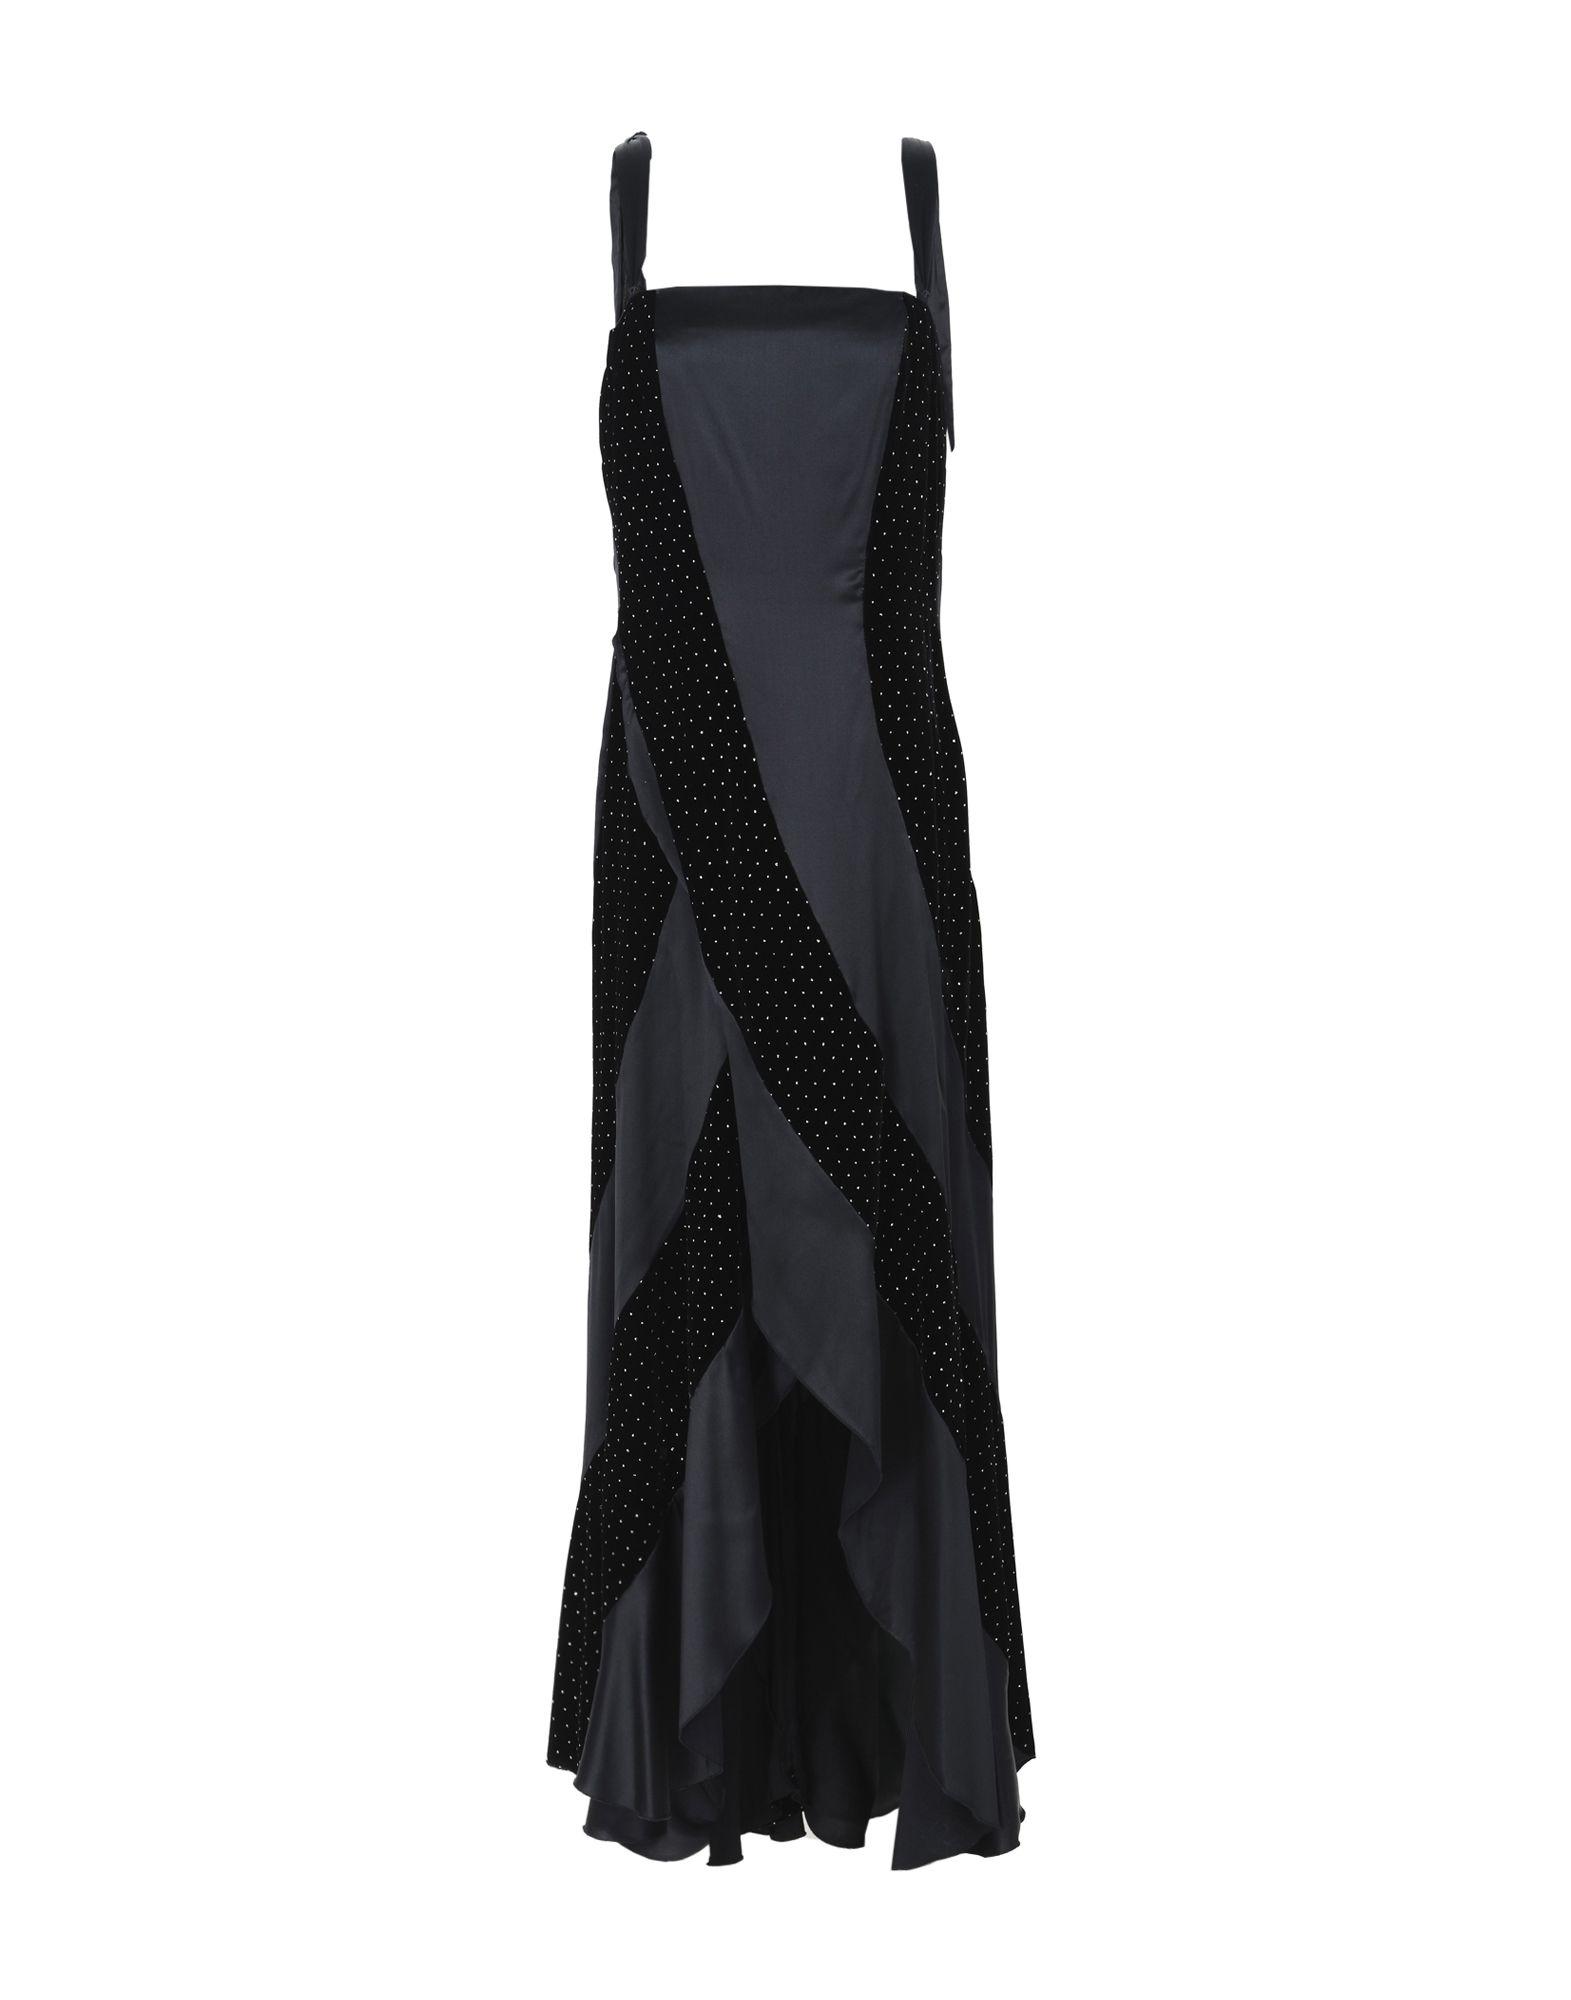 MARINA BABINI Длинное платье платье walter babini